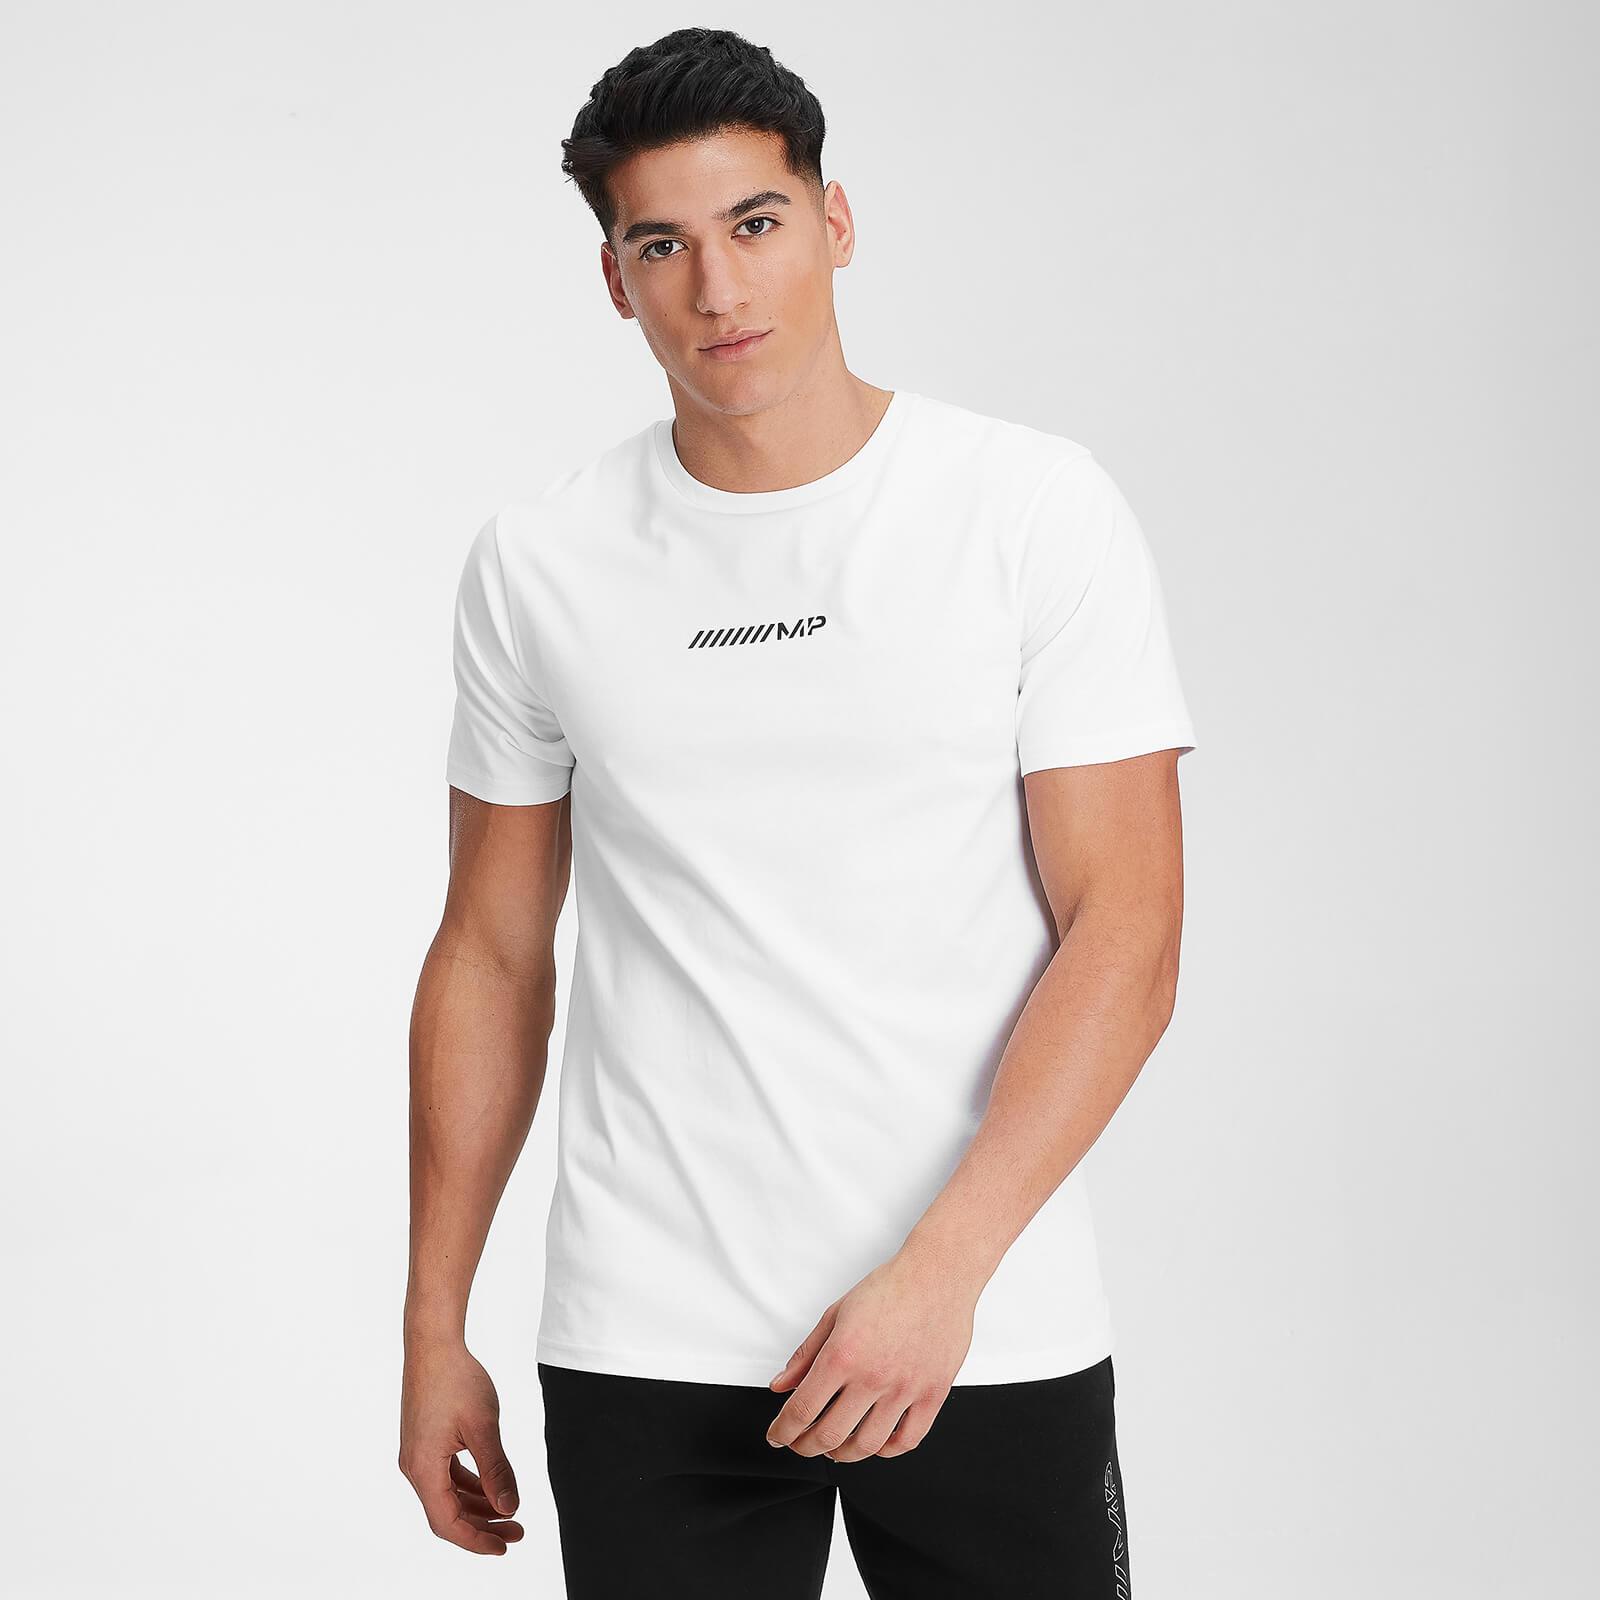 MP Men's Contrast Graphic Short Sleeve T-Shirt - White - XXS